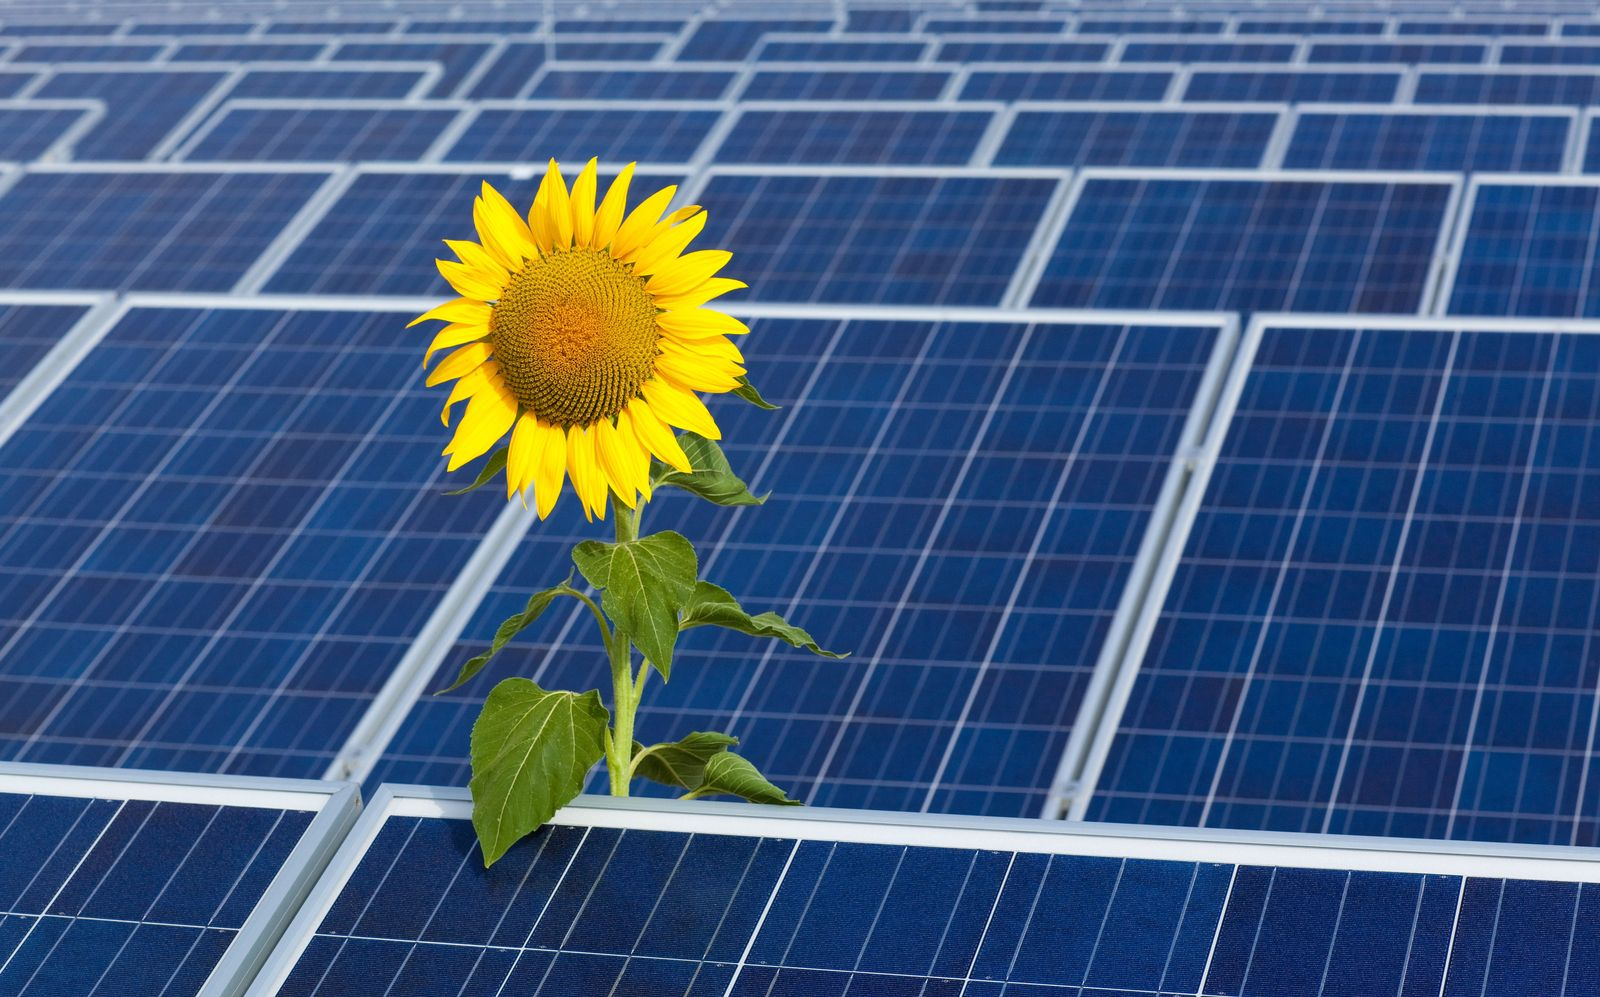 Google / Solarpark / Brandenburg